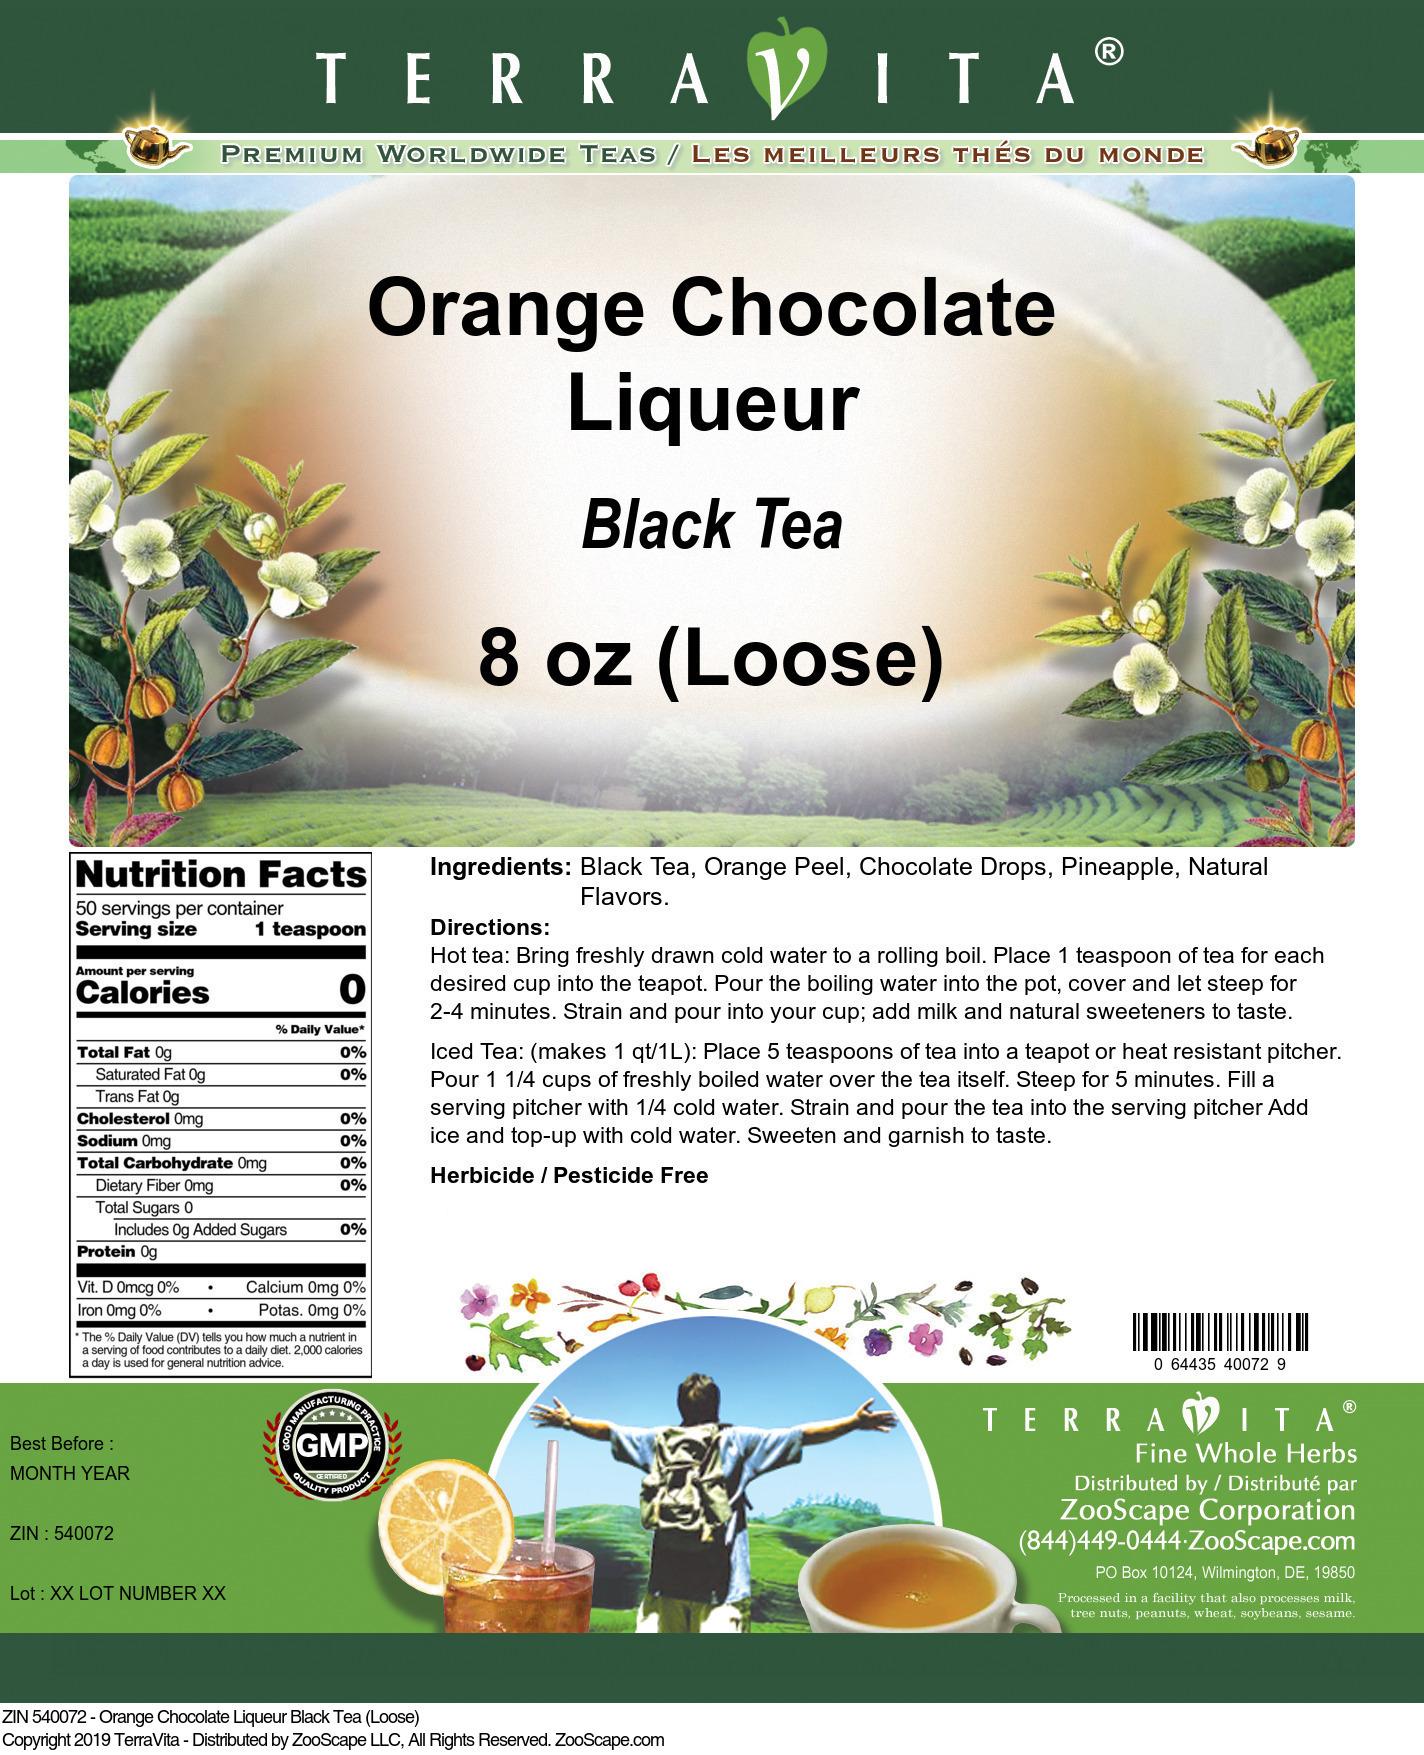 Orange Chocolate Liqueur Black Tea (Loose)